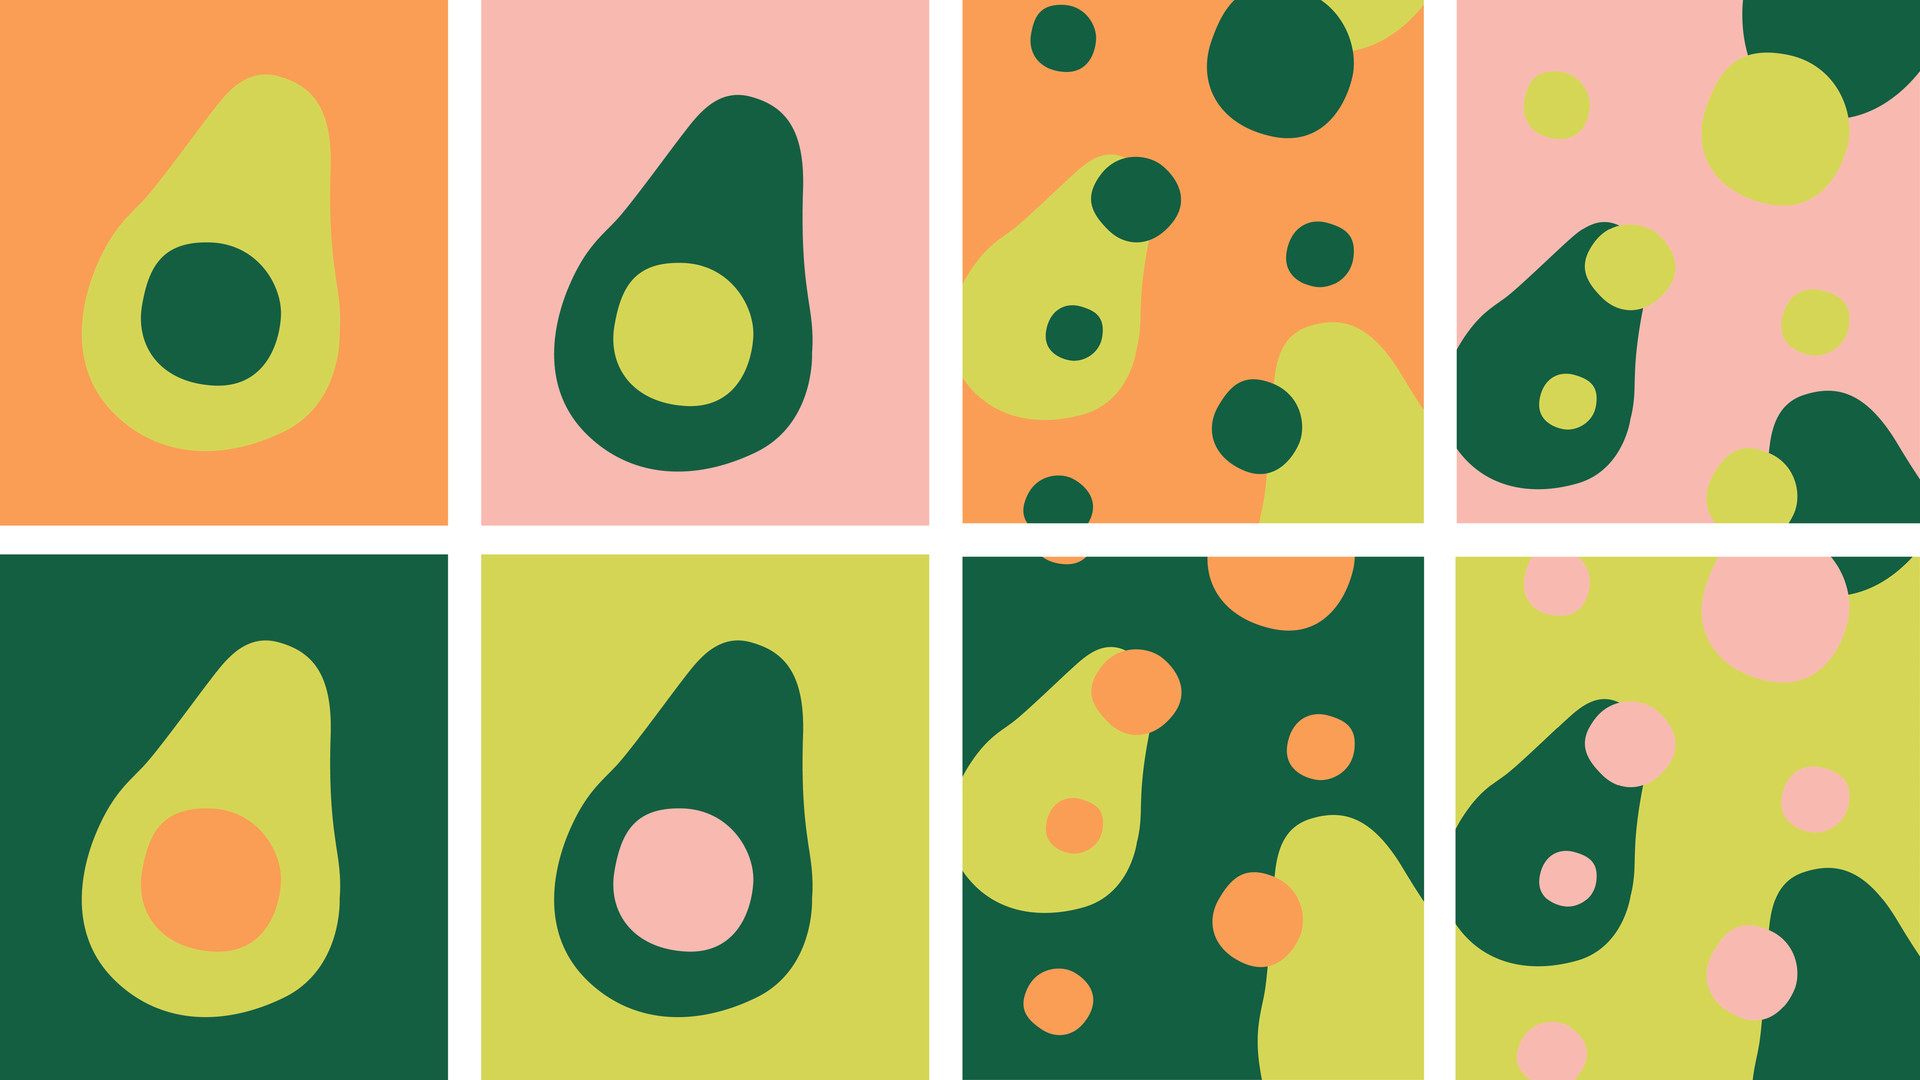 Motifs avocado